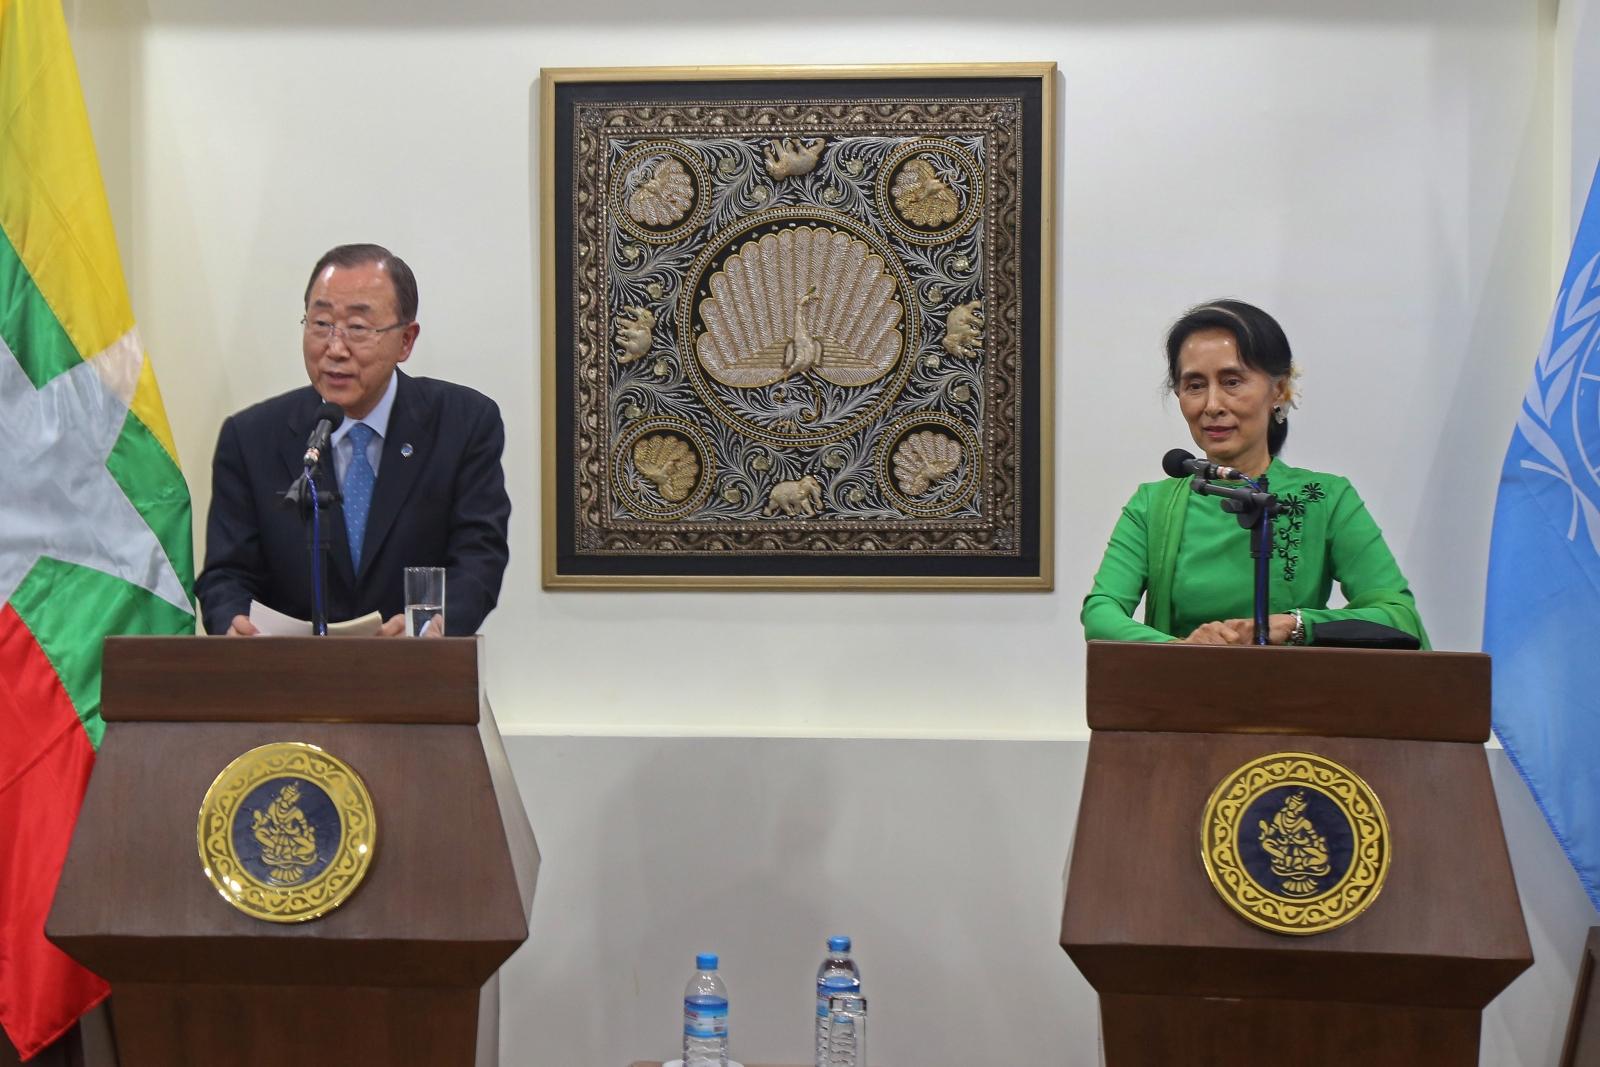 Aung San Suu Kyi Hosts Ethnic Minorities In Myanmar